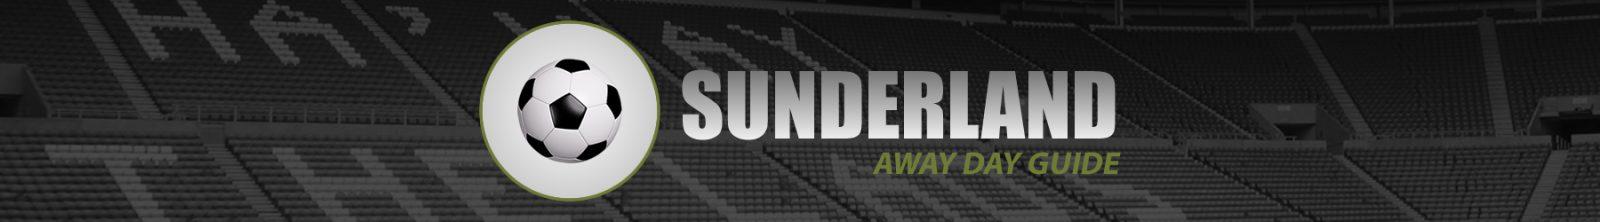 Sunderland Away